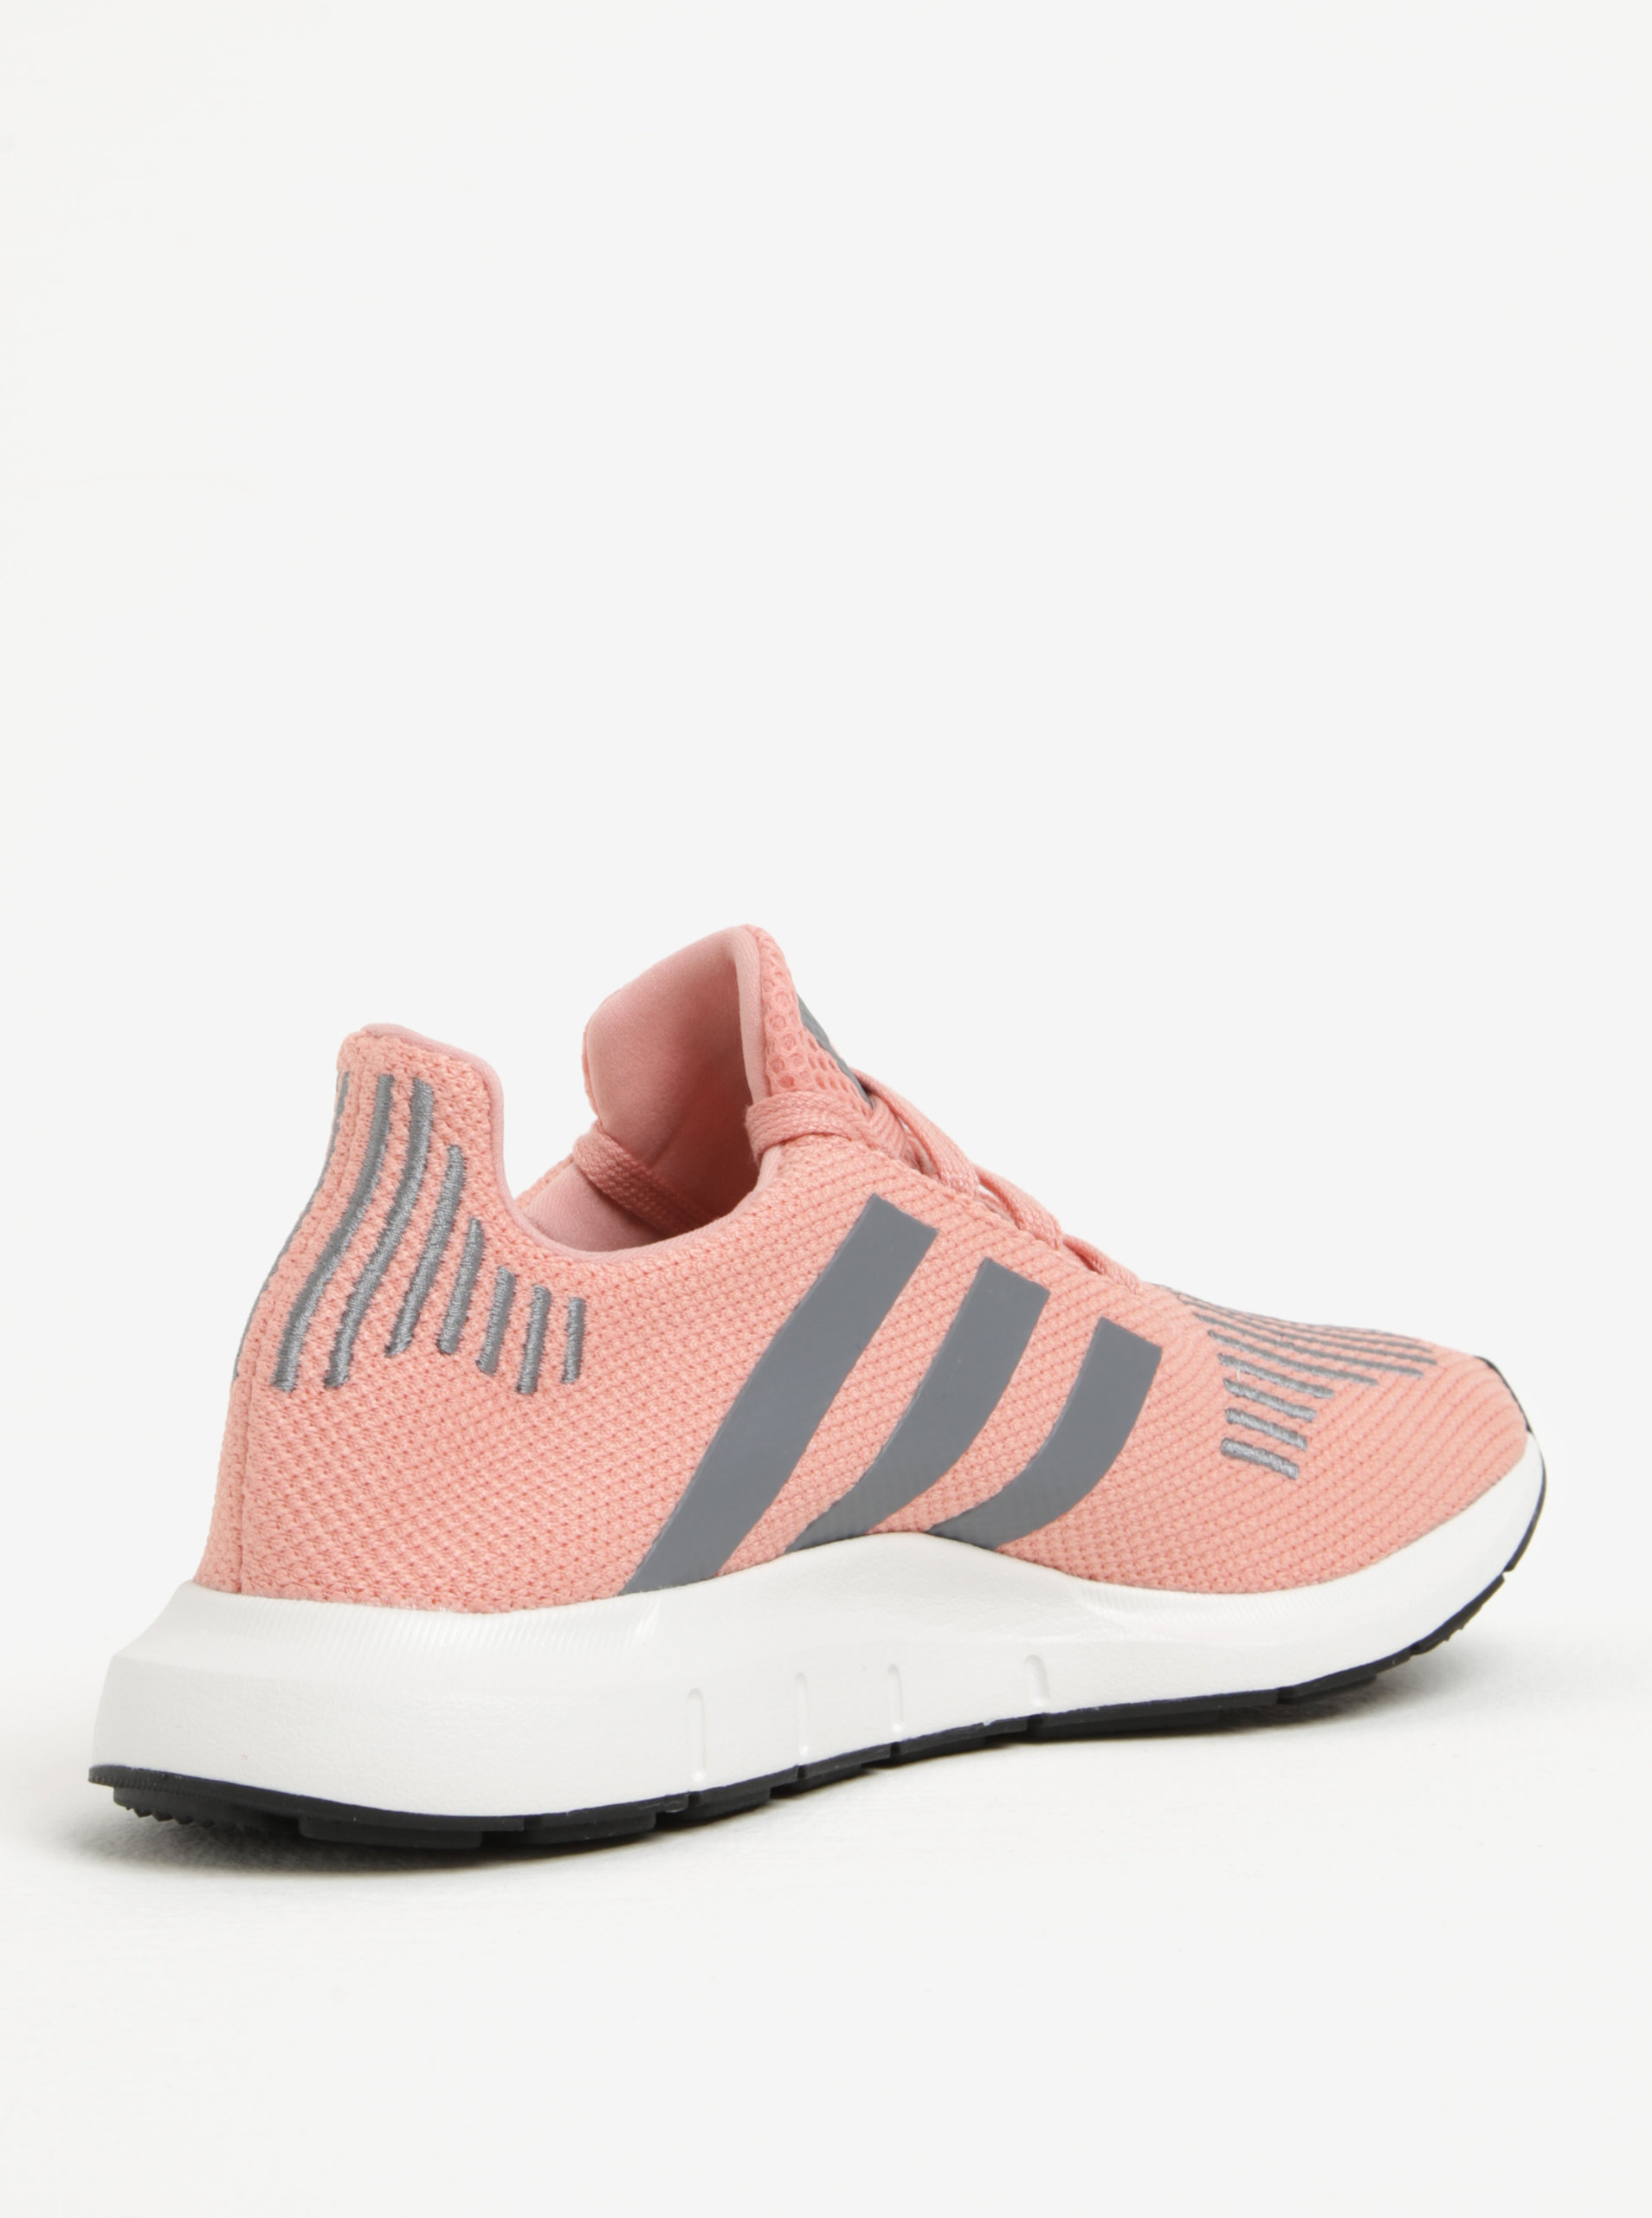 9c4619affe Světle růžové dámské tenisky adidas Originals Swift Run ...